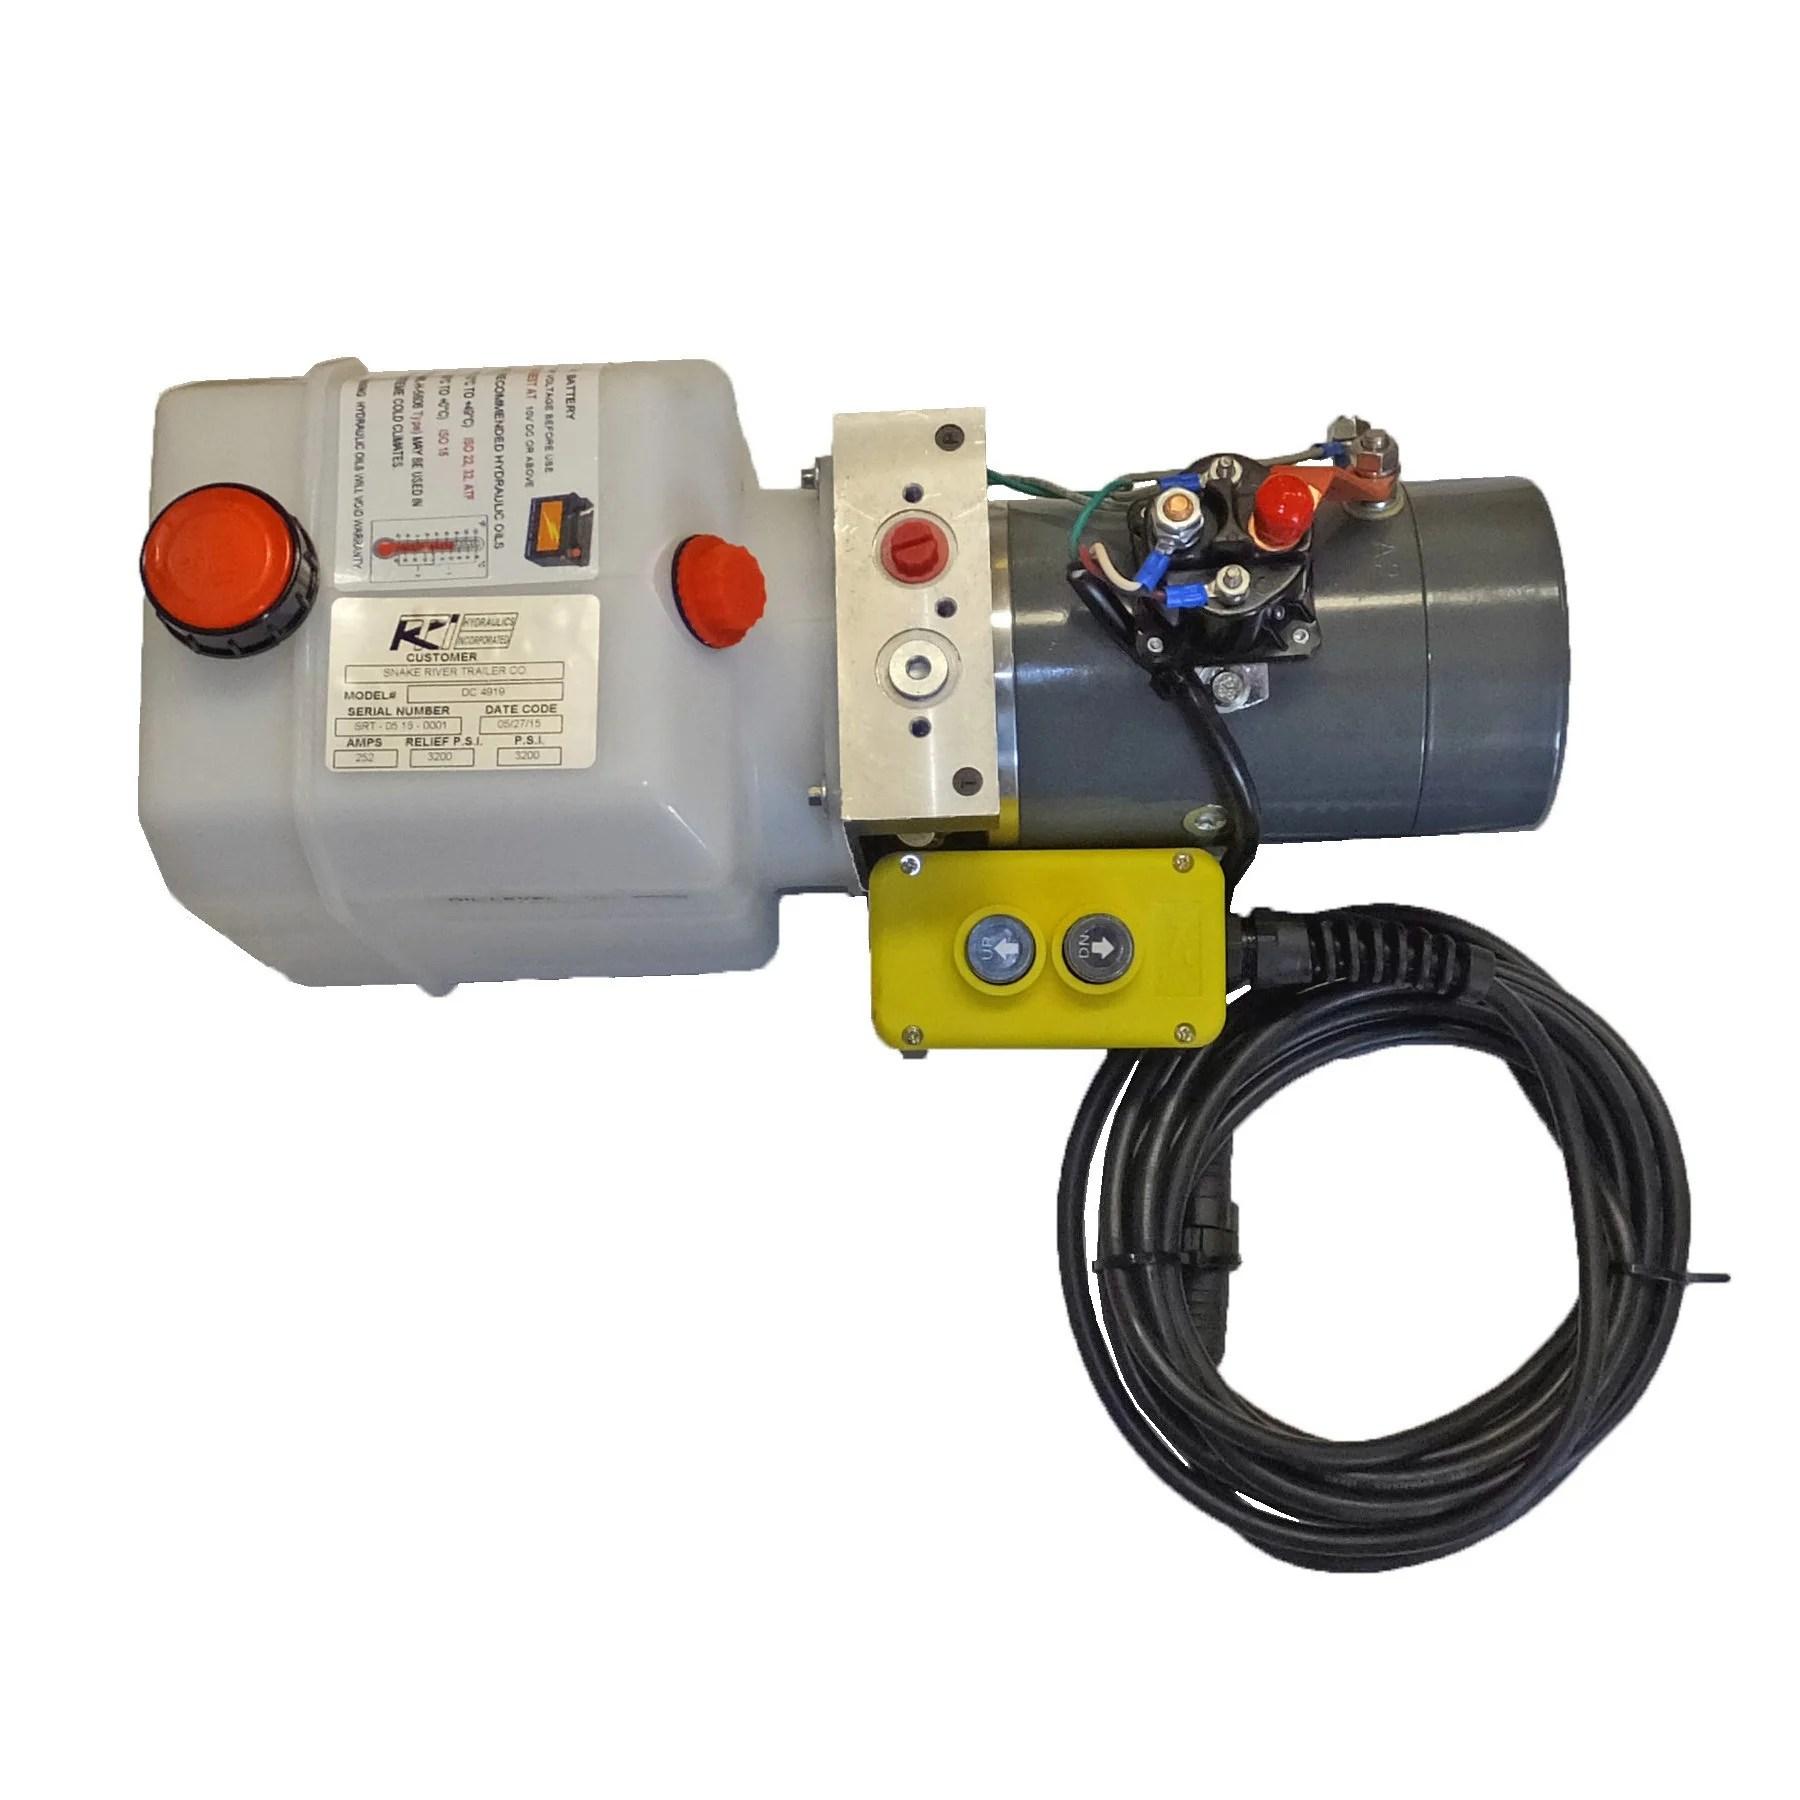 medium resolution of kti dc 4919 hydraulic hoist pump single acting power up gravity down